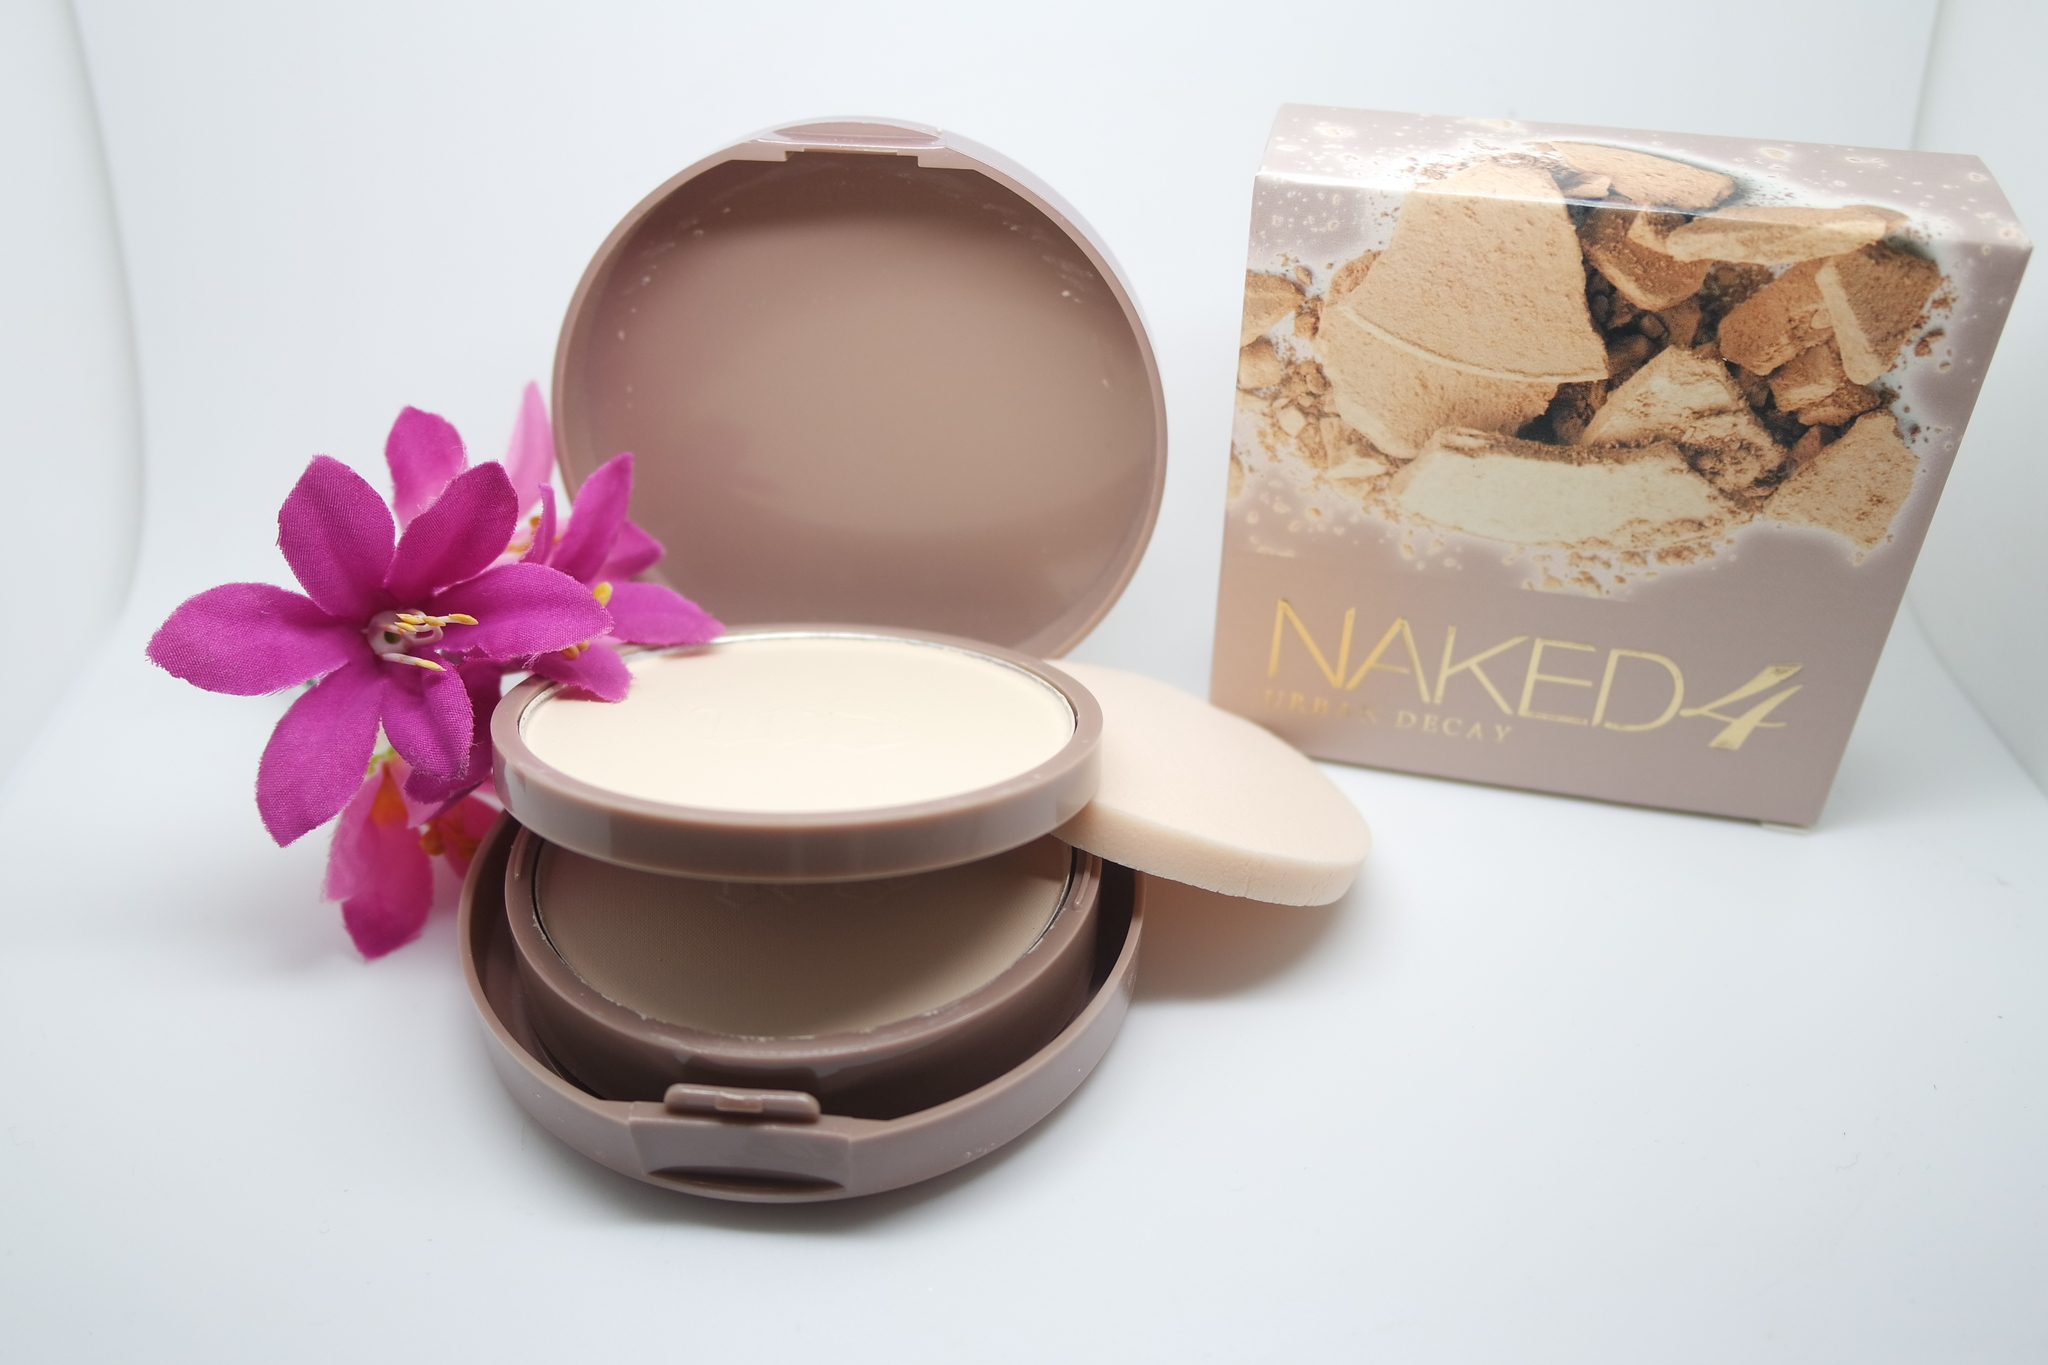 Jual Bedak Naked 2in1 Variasi 2 In 1 4your Chocolate Beauty Tokopedia